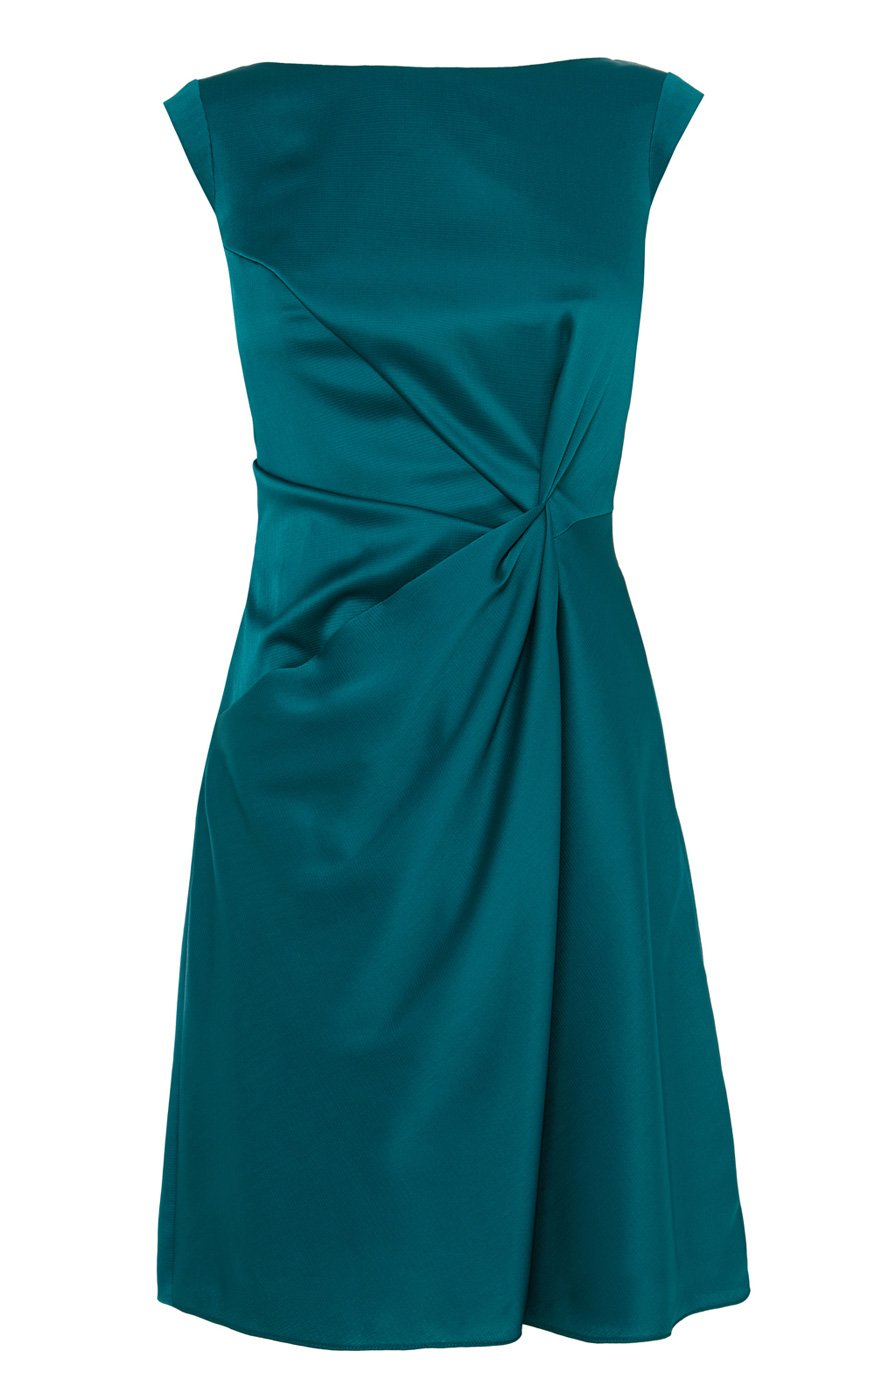 Lyst - Karen Millen Monochrome Shift Dress in Blue